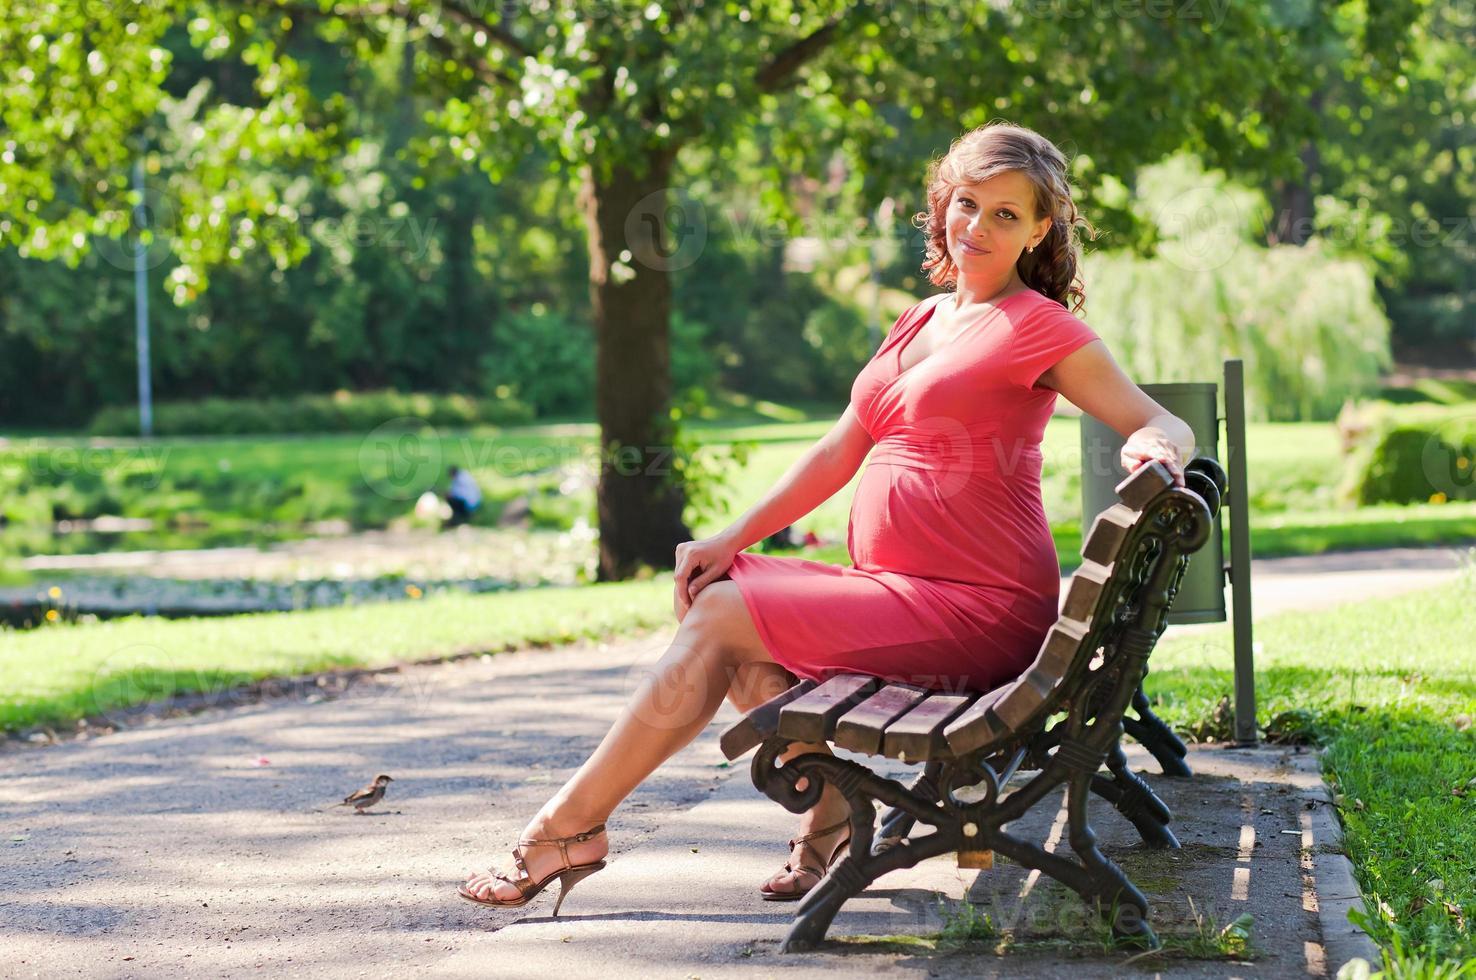 junge schwangere Frau im Park foto